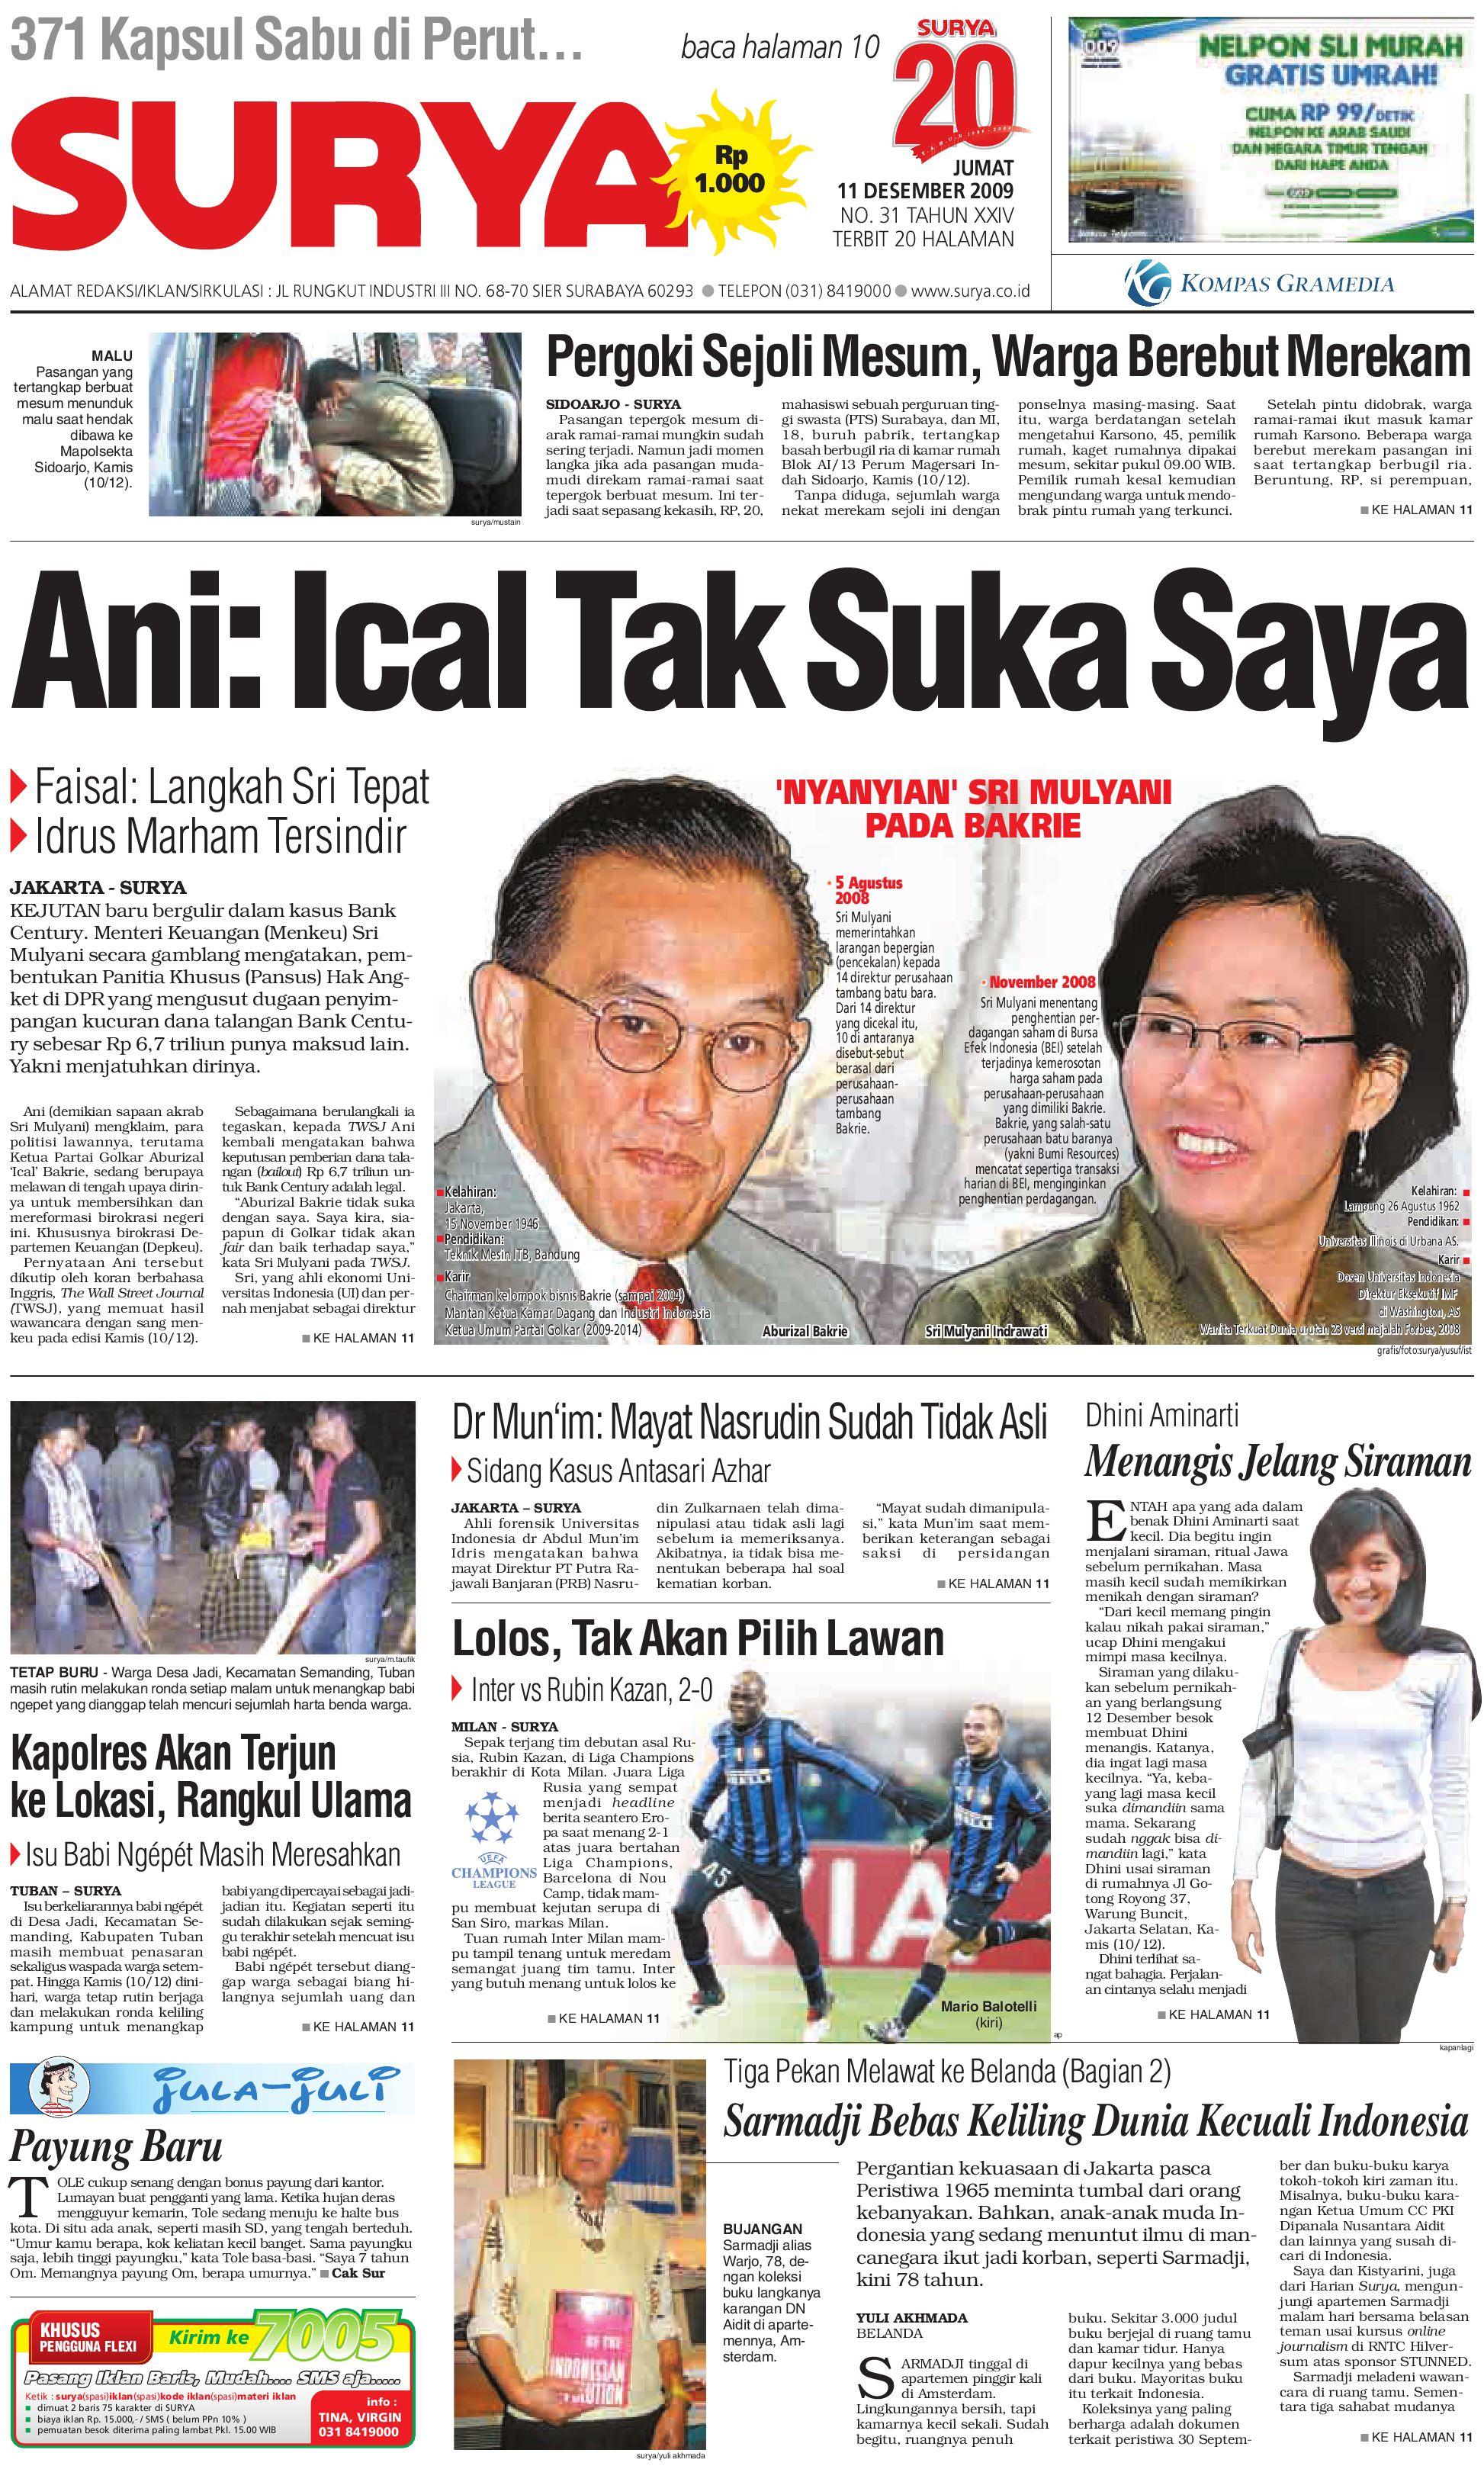 surya edisi cetak 11 des 2009 by harian surya issuu